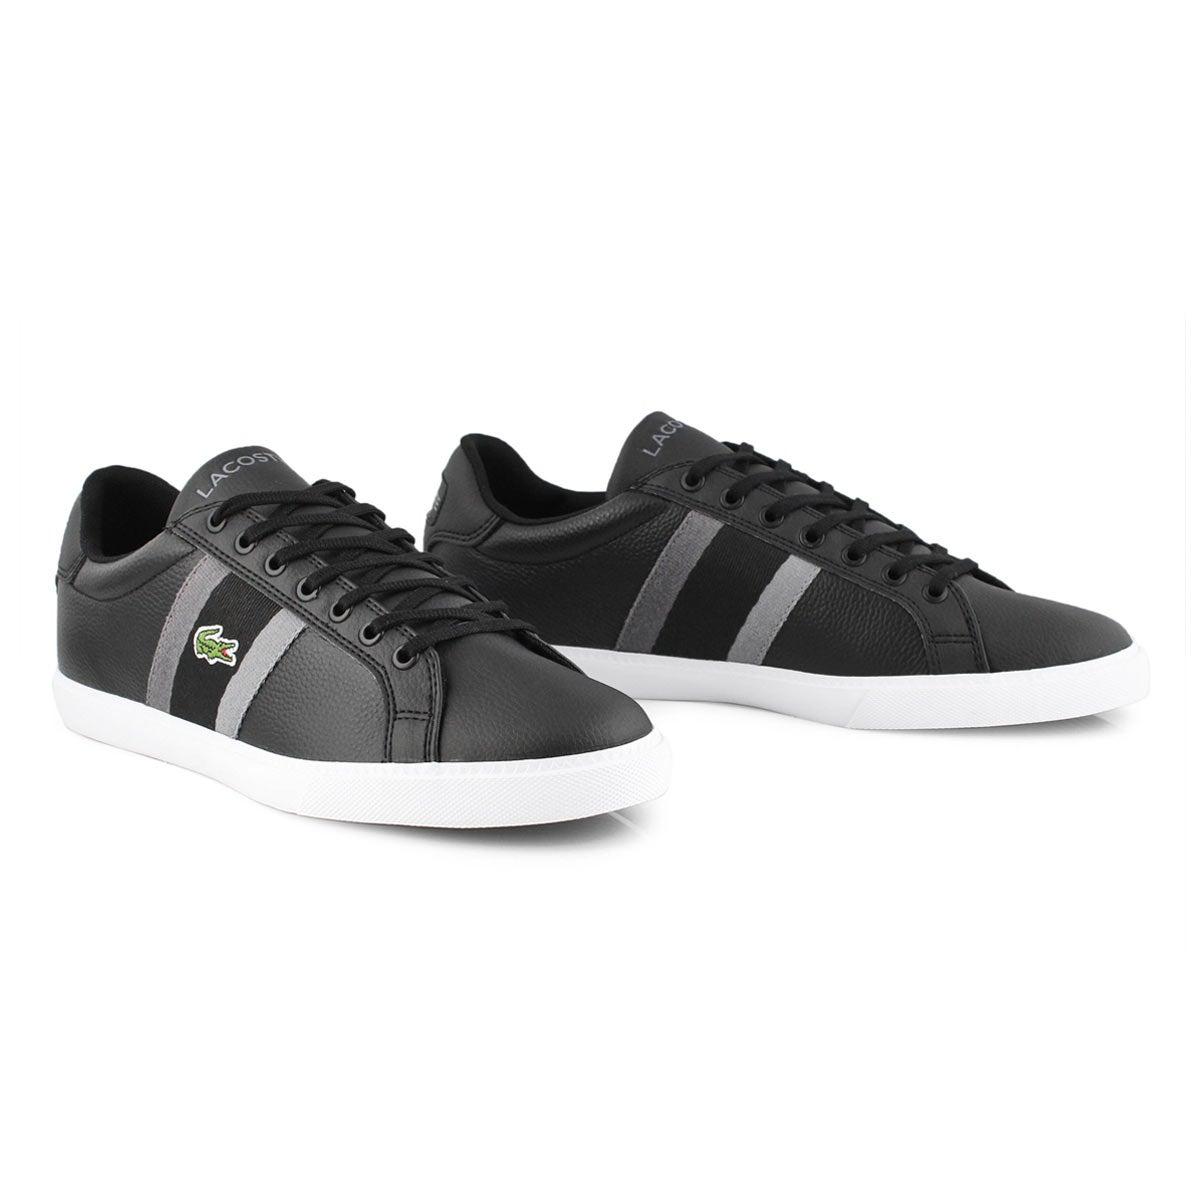 Men's Grad Vulc 120 2 Sneaker - Black/Grey